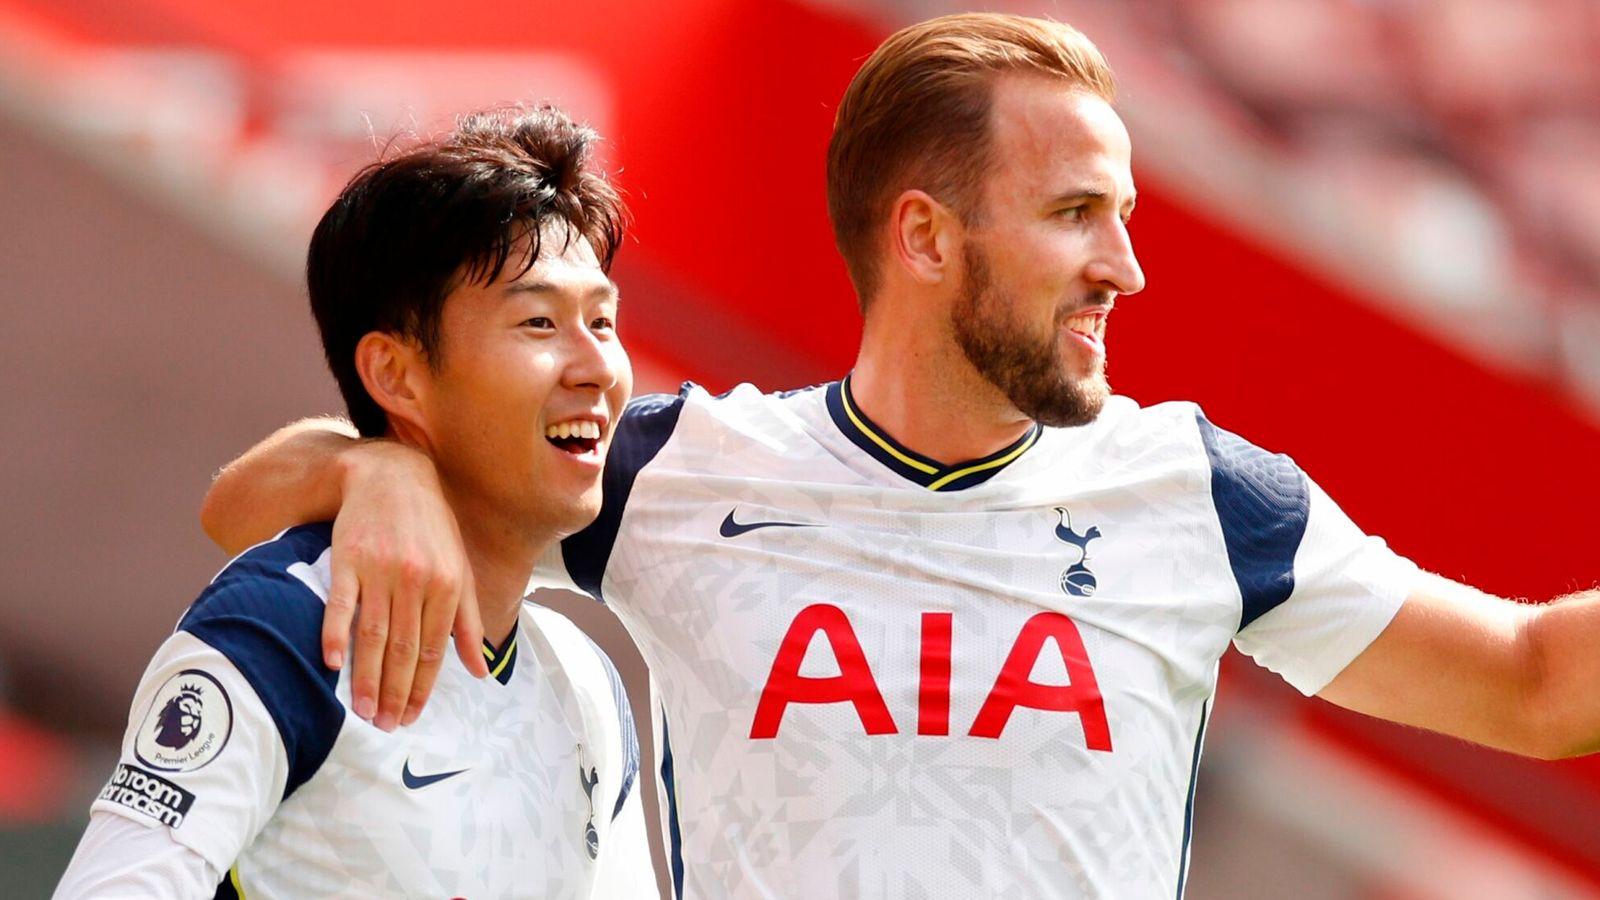 Jose Mourinho says Tottenham are nowhere near his old Real Madrid team yet - Bóng Đá